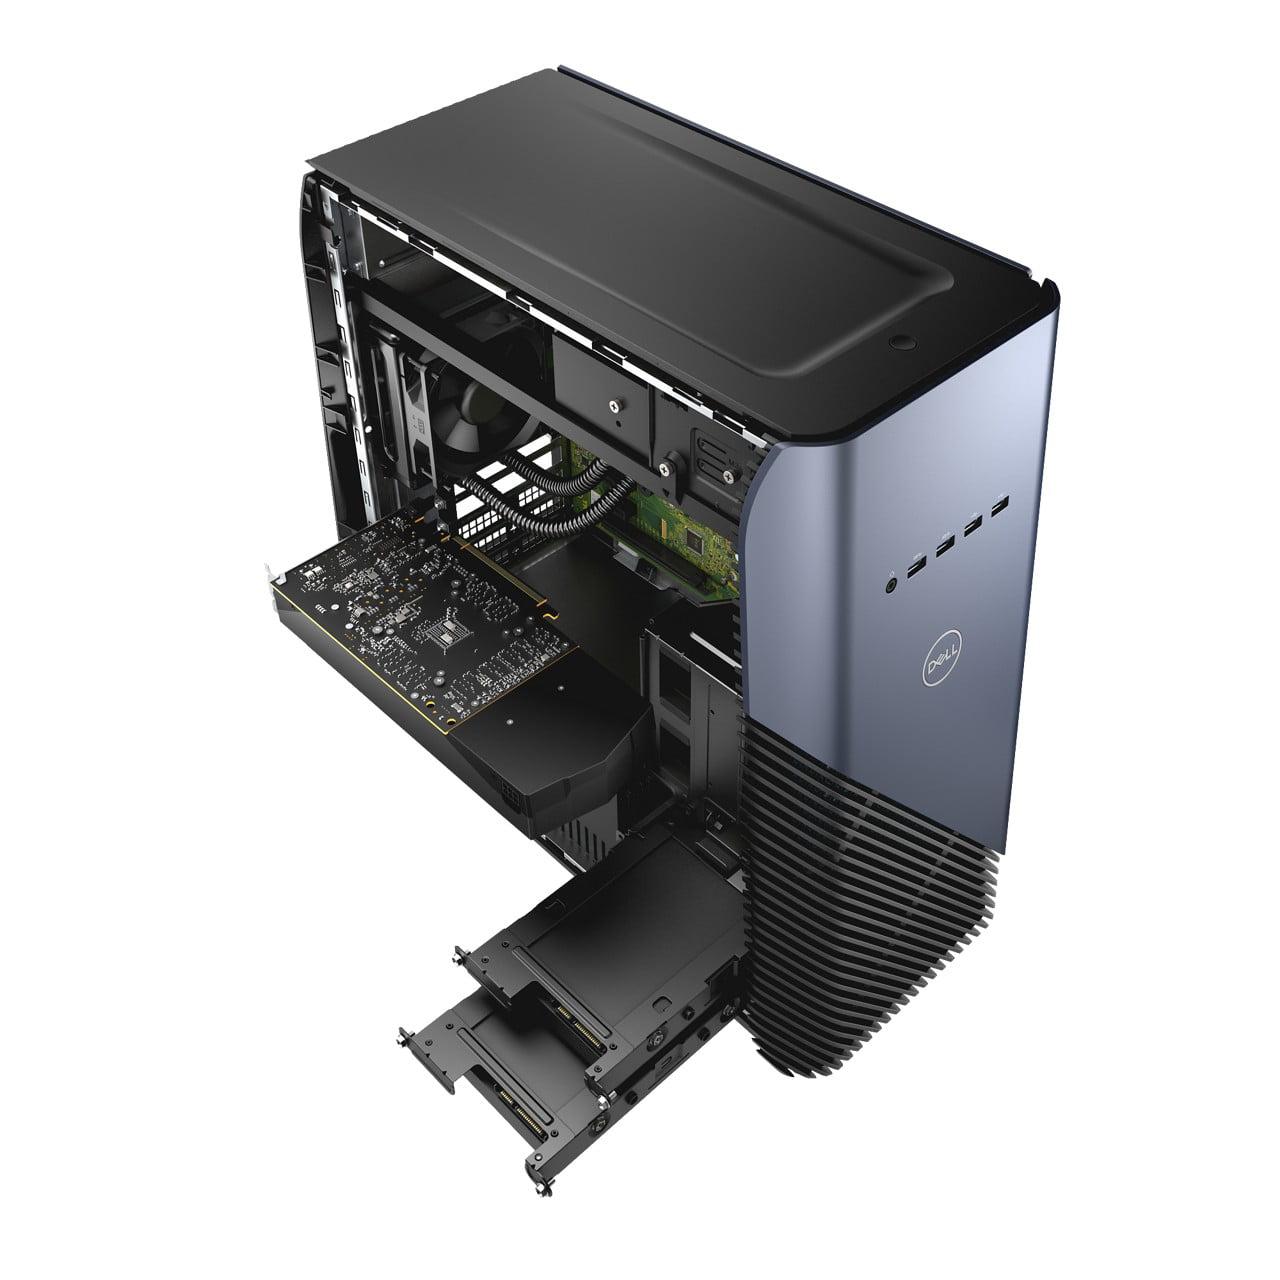 Dell Inspiron 5680 Gaming Desktop Intel i7 8700 NVIDIA GTX 1070 256GB SSD + 1TB HDD 16 GB RAM